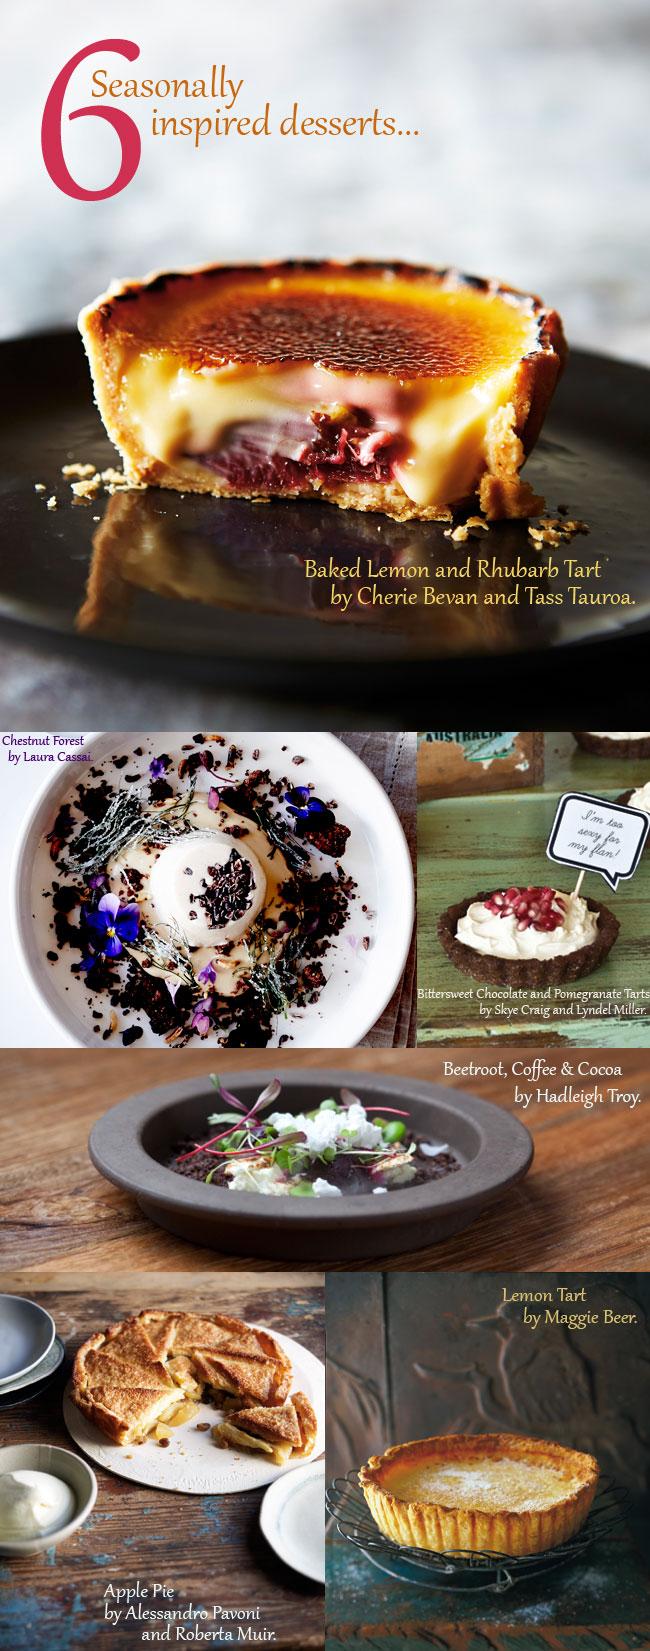 6 Seasonally Inspired Desserts